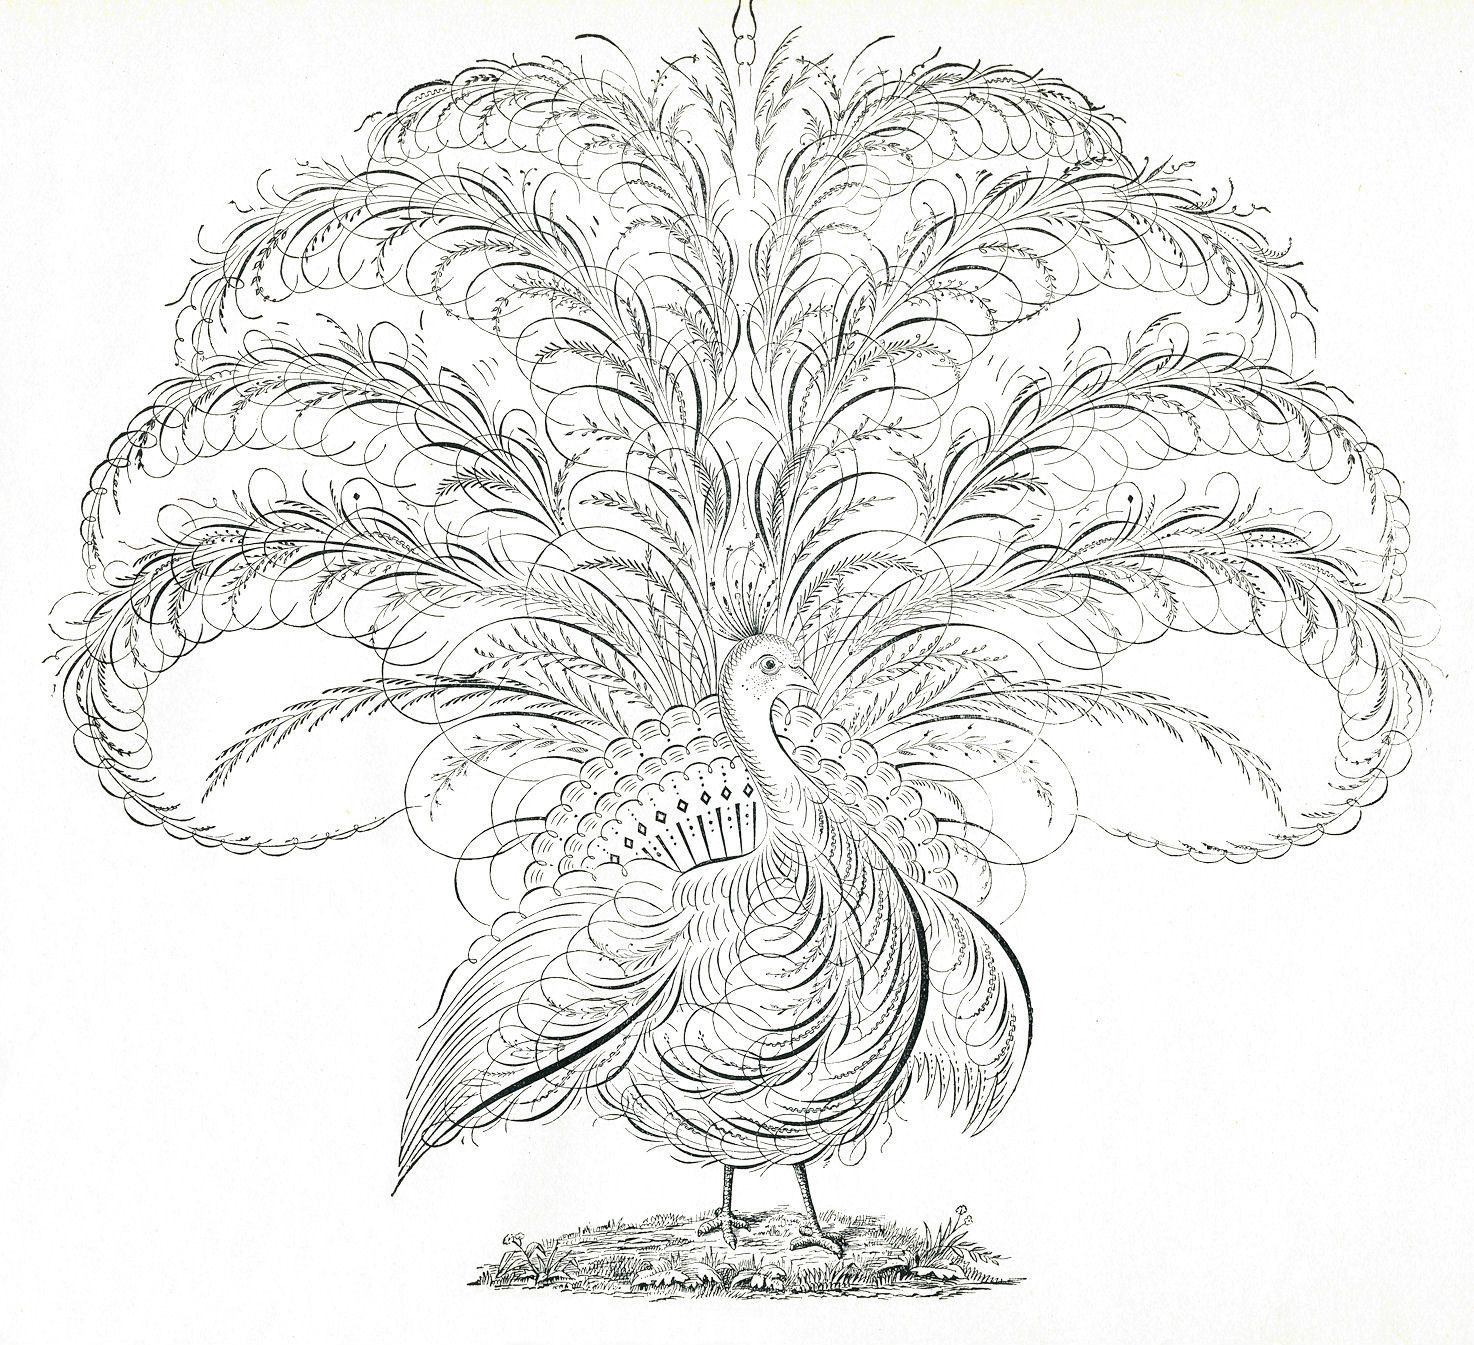 Vintage peacock shabby chic transfer//sticker decoupageTypography spencerian